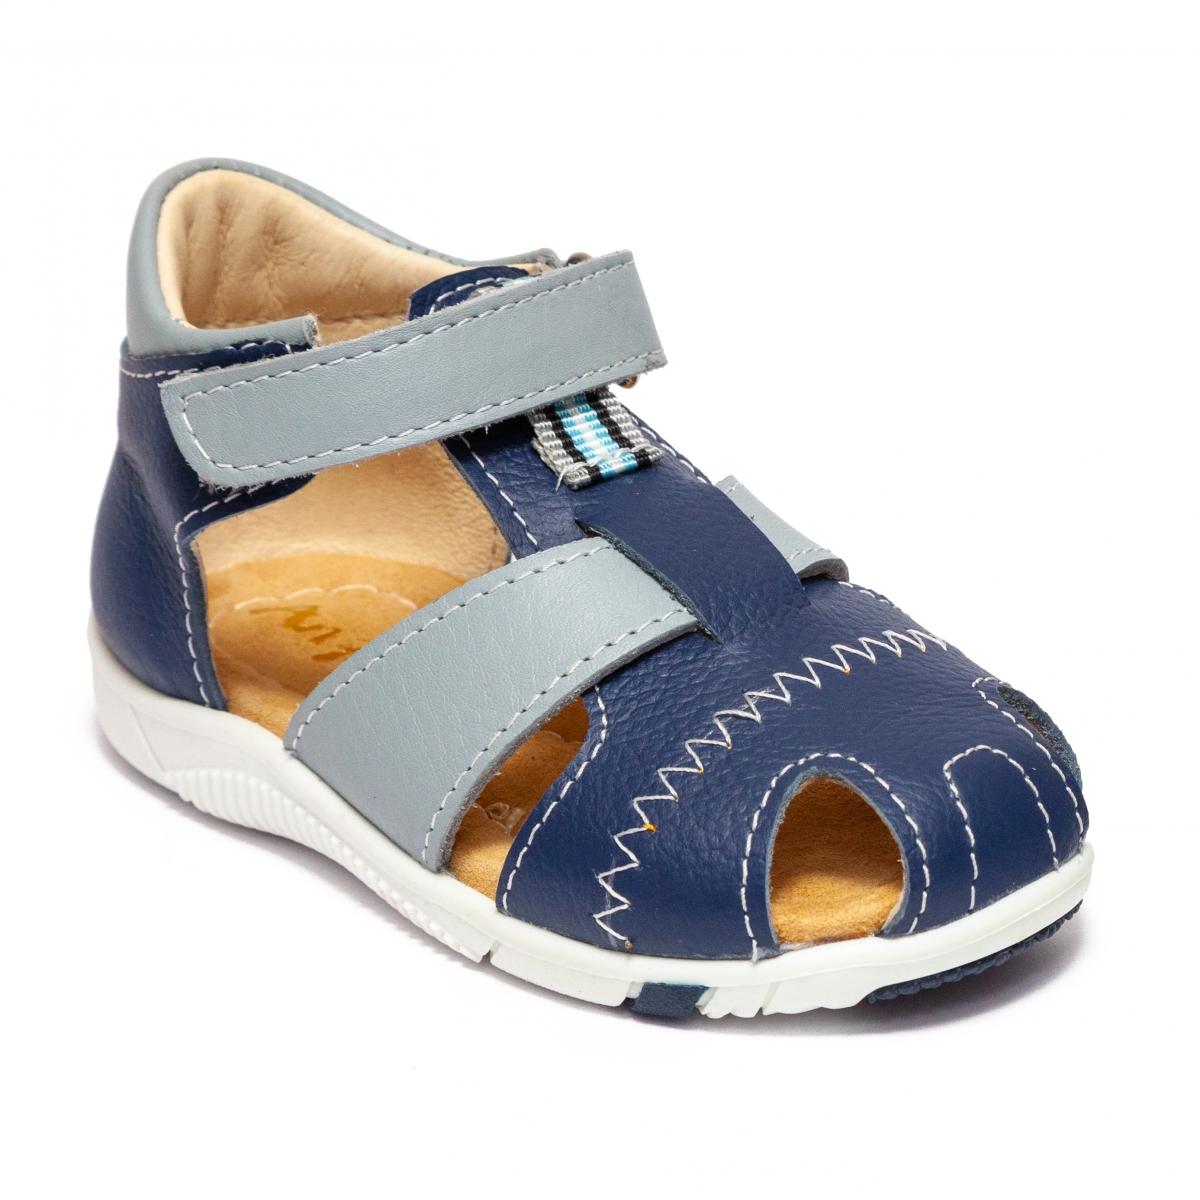 Sandale baieti Angel albastru 18-25